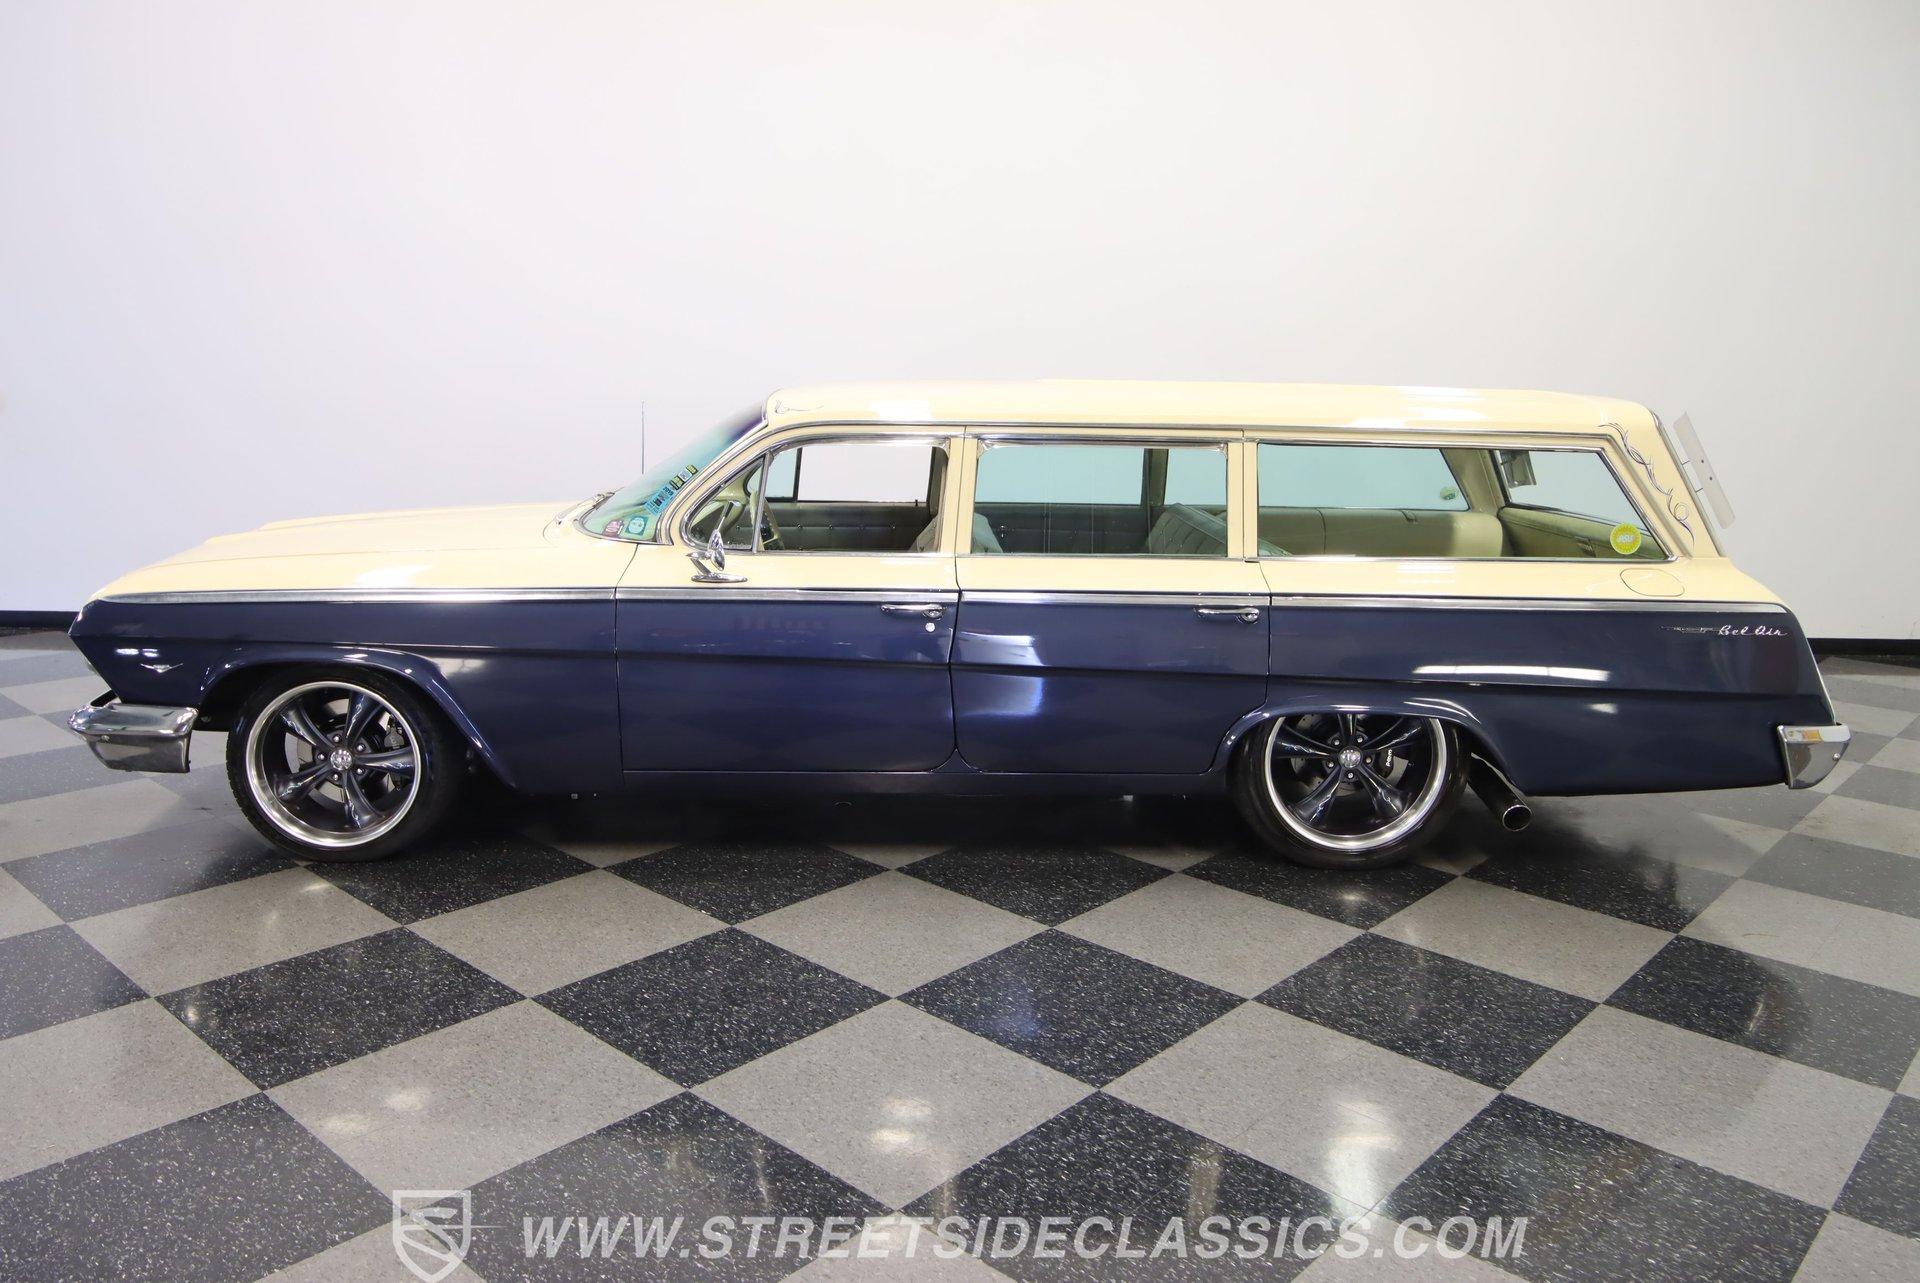 1962 chevrolet bel air restomod wagon